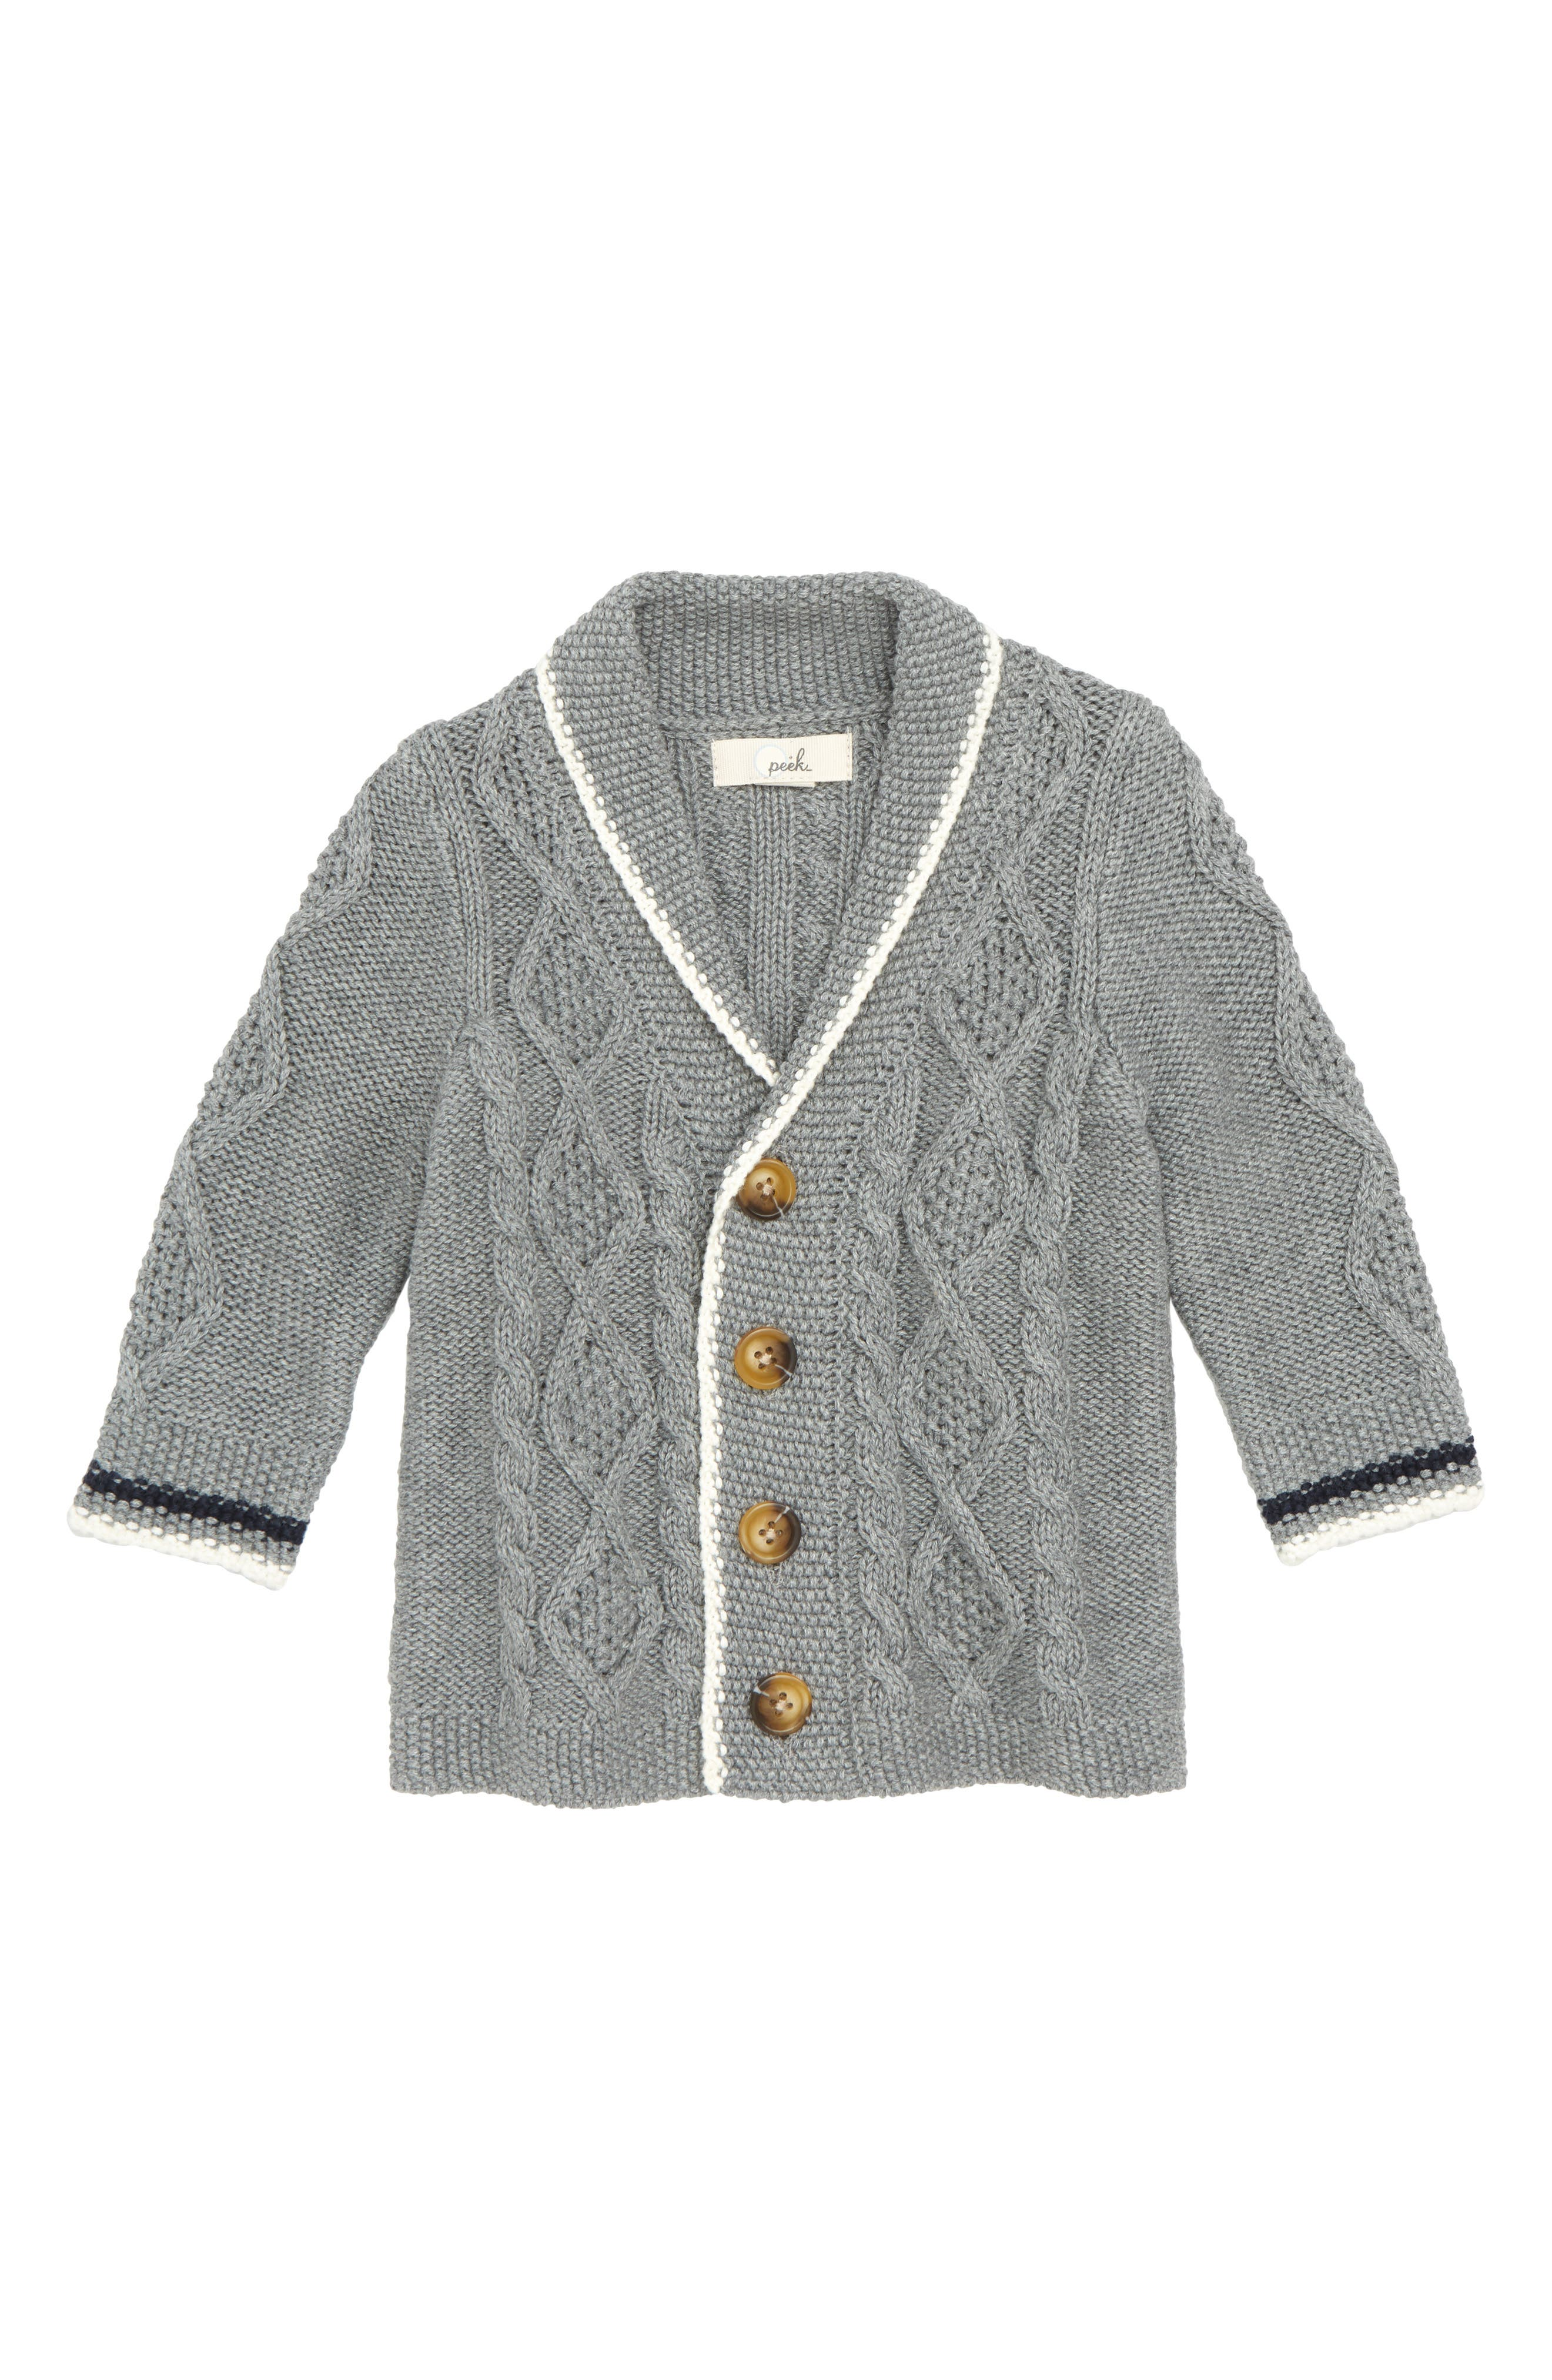 Peek Hugh Cable Knit Cardigan,                         Main,                         color, 020